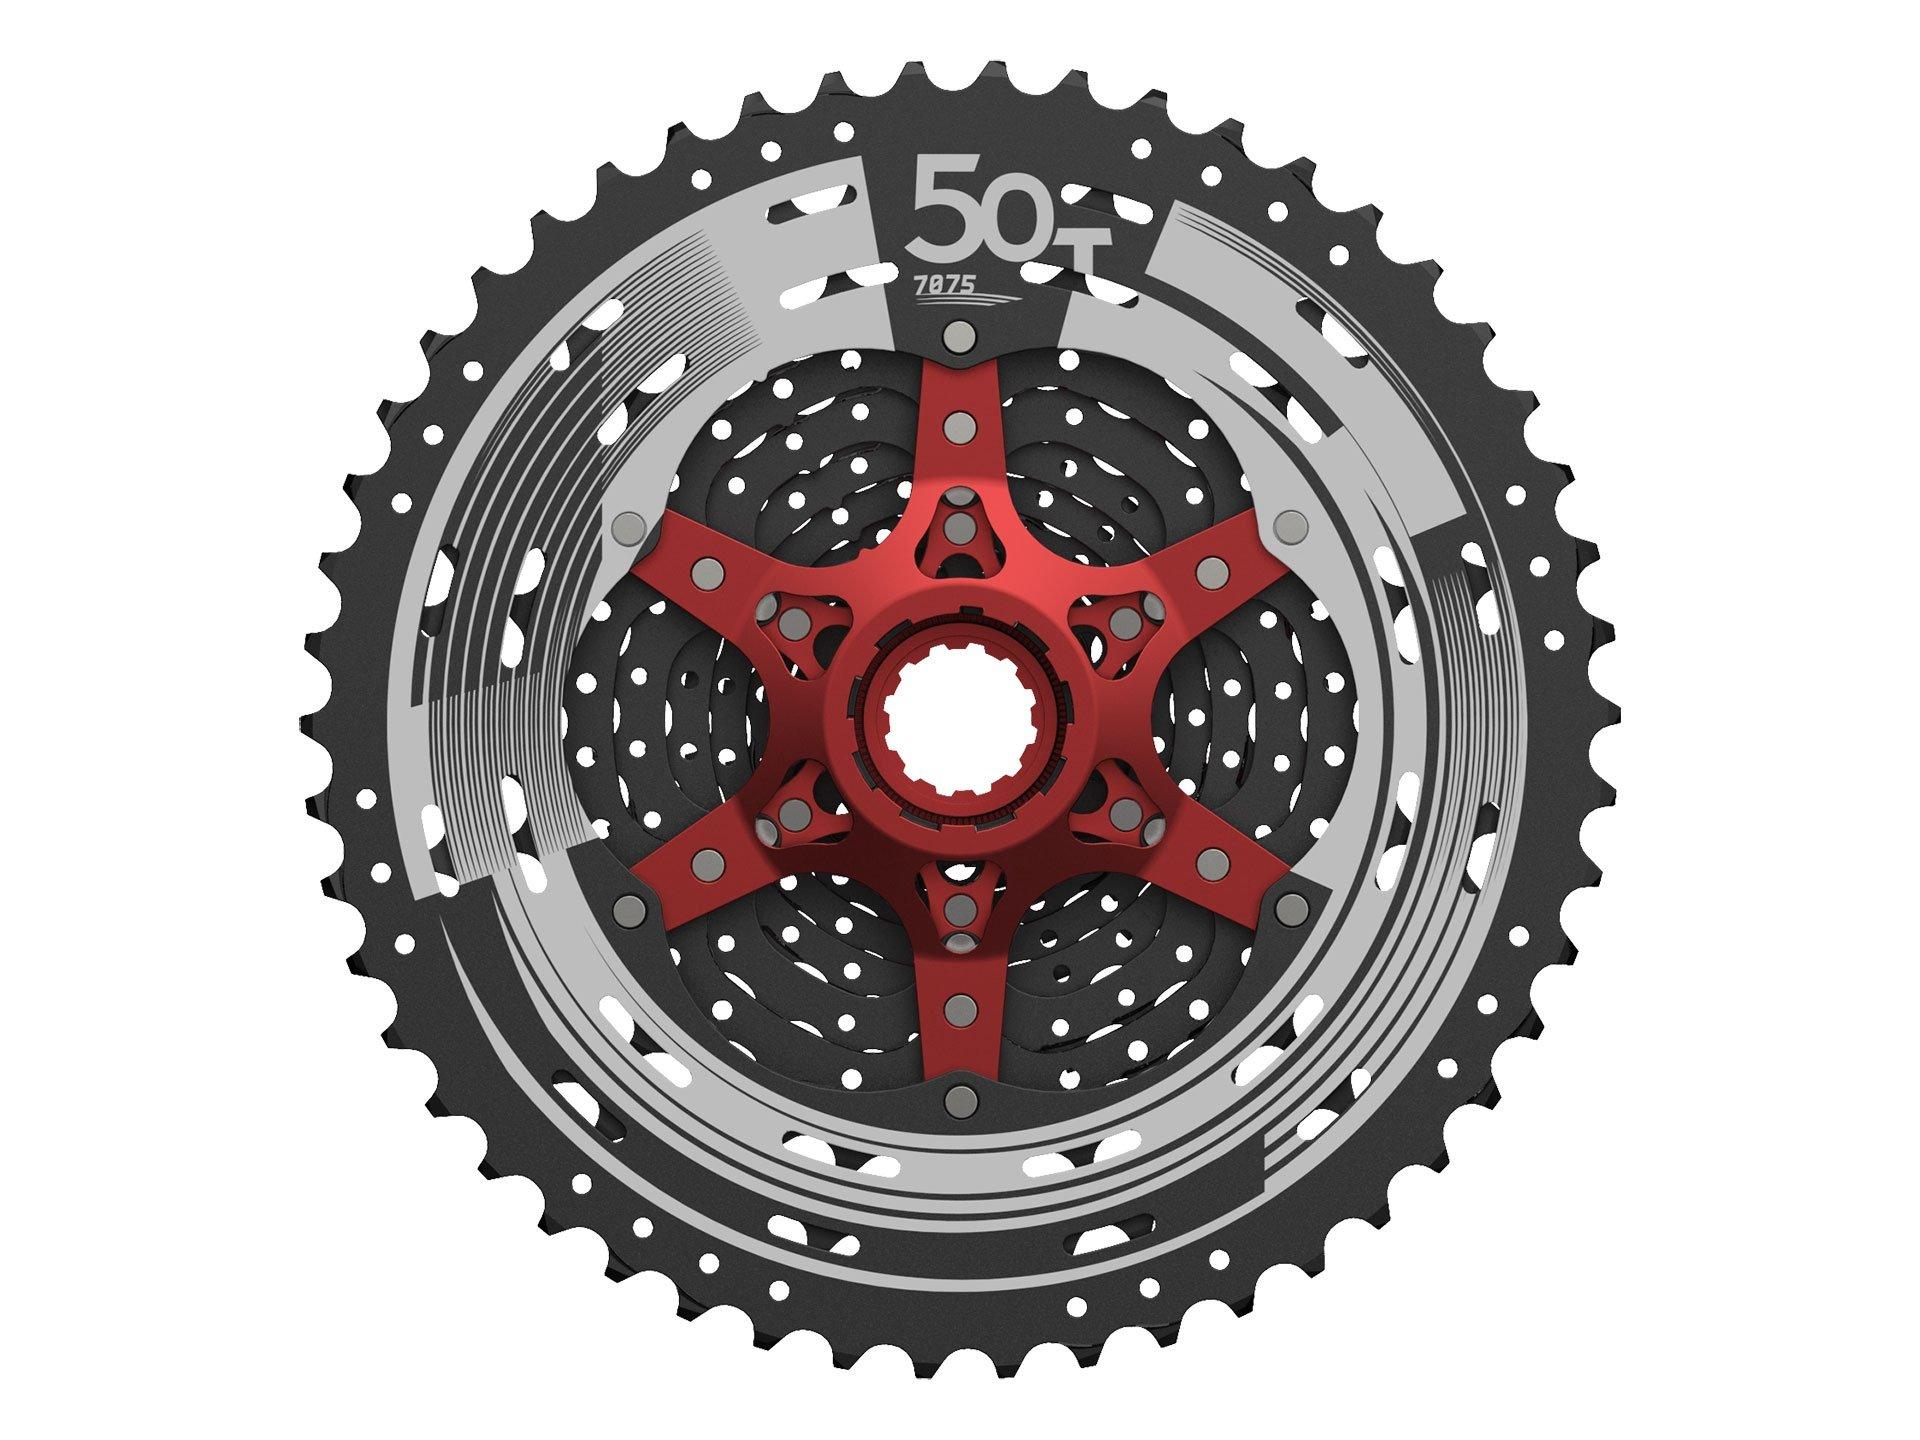 Sunrace 12-speed 11-50T cassette freewheel CSMZ90 WA5 wide ratio MTB in Black with RD extender by JGbike (Image #4)